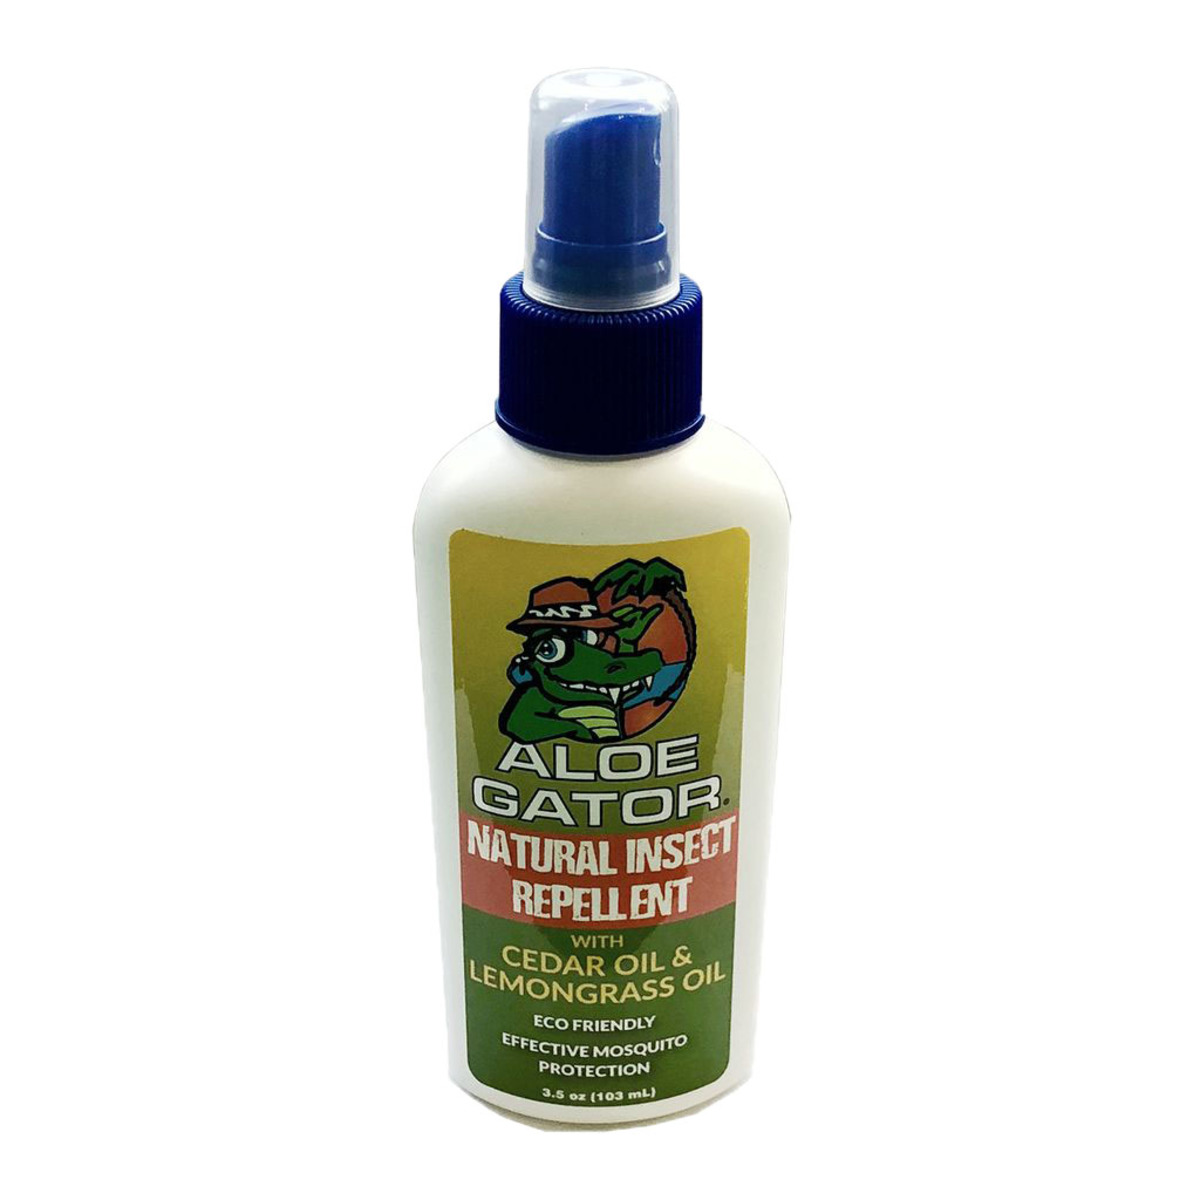 Natural Insect Repellent Pump Spray, 3oz